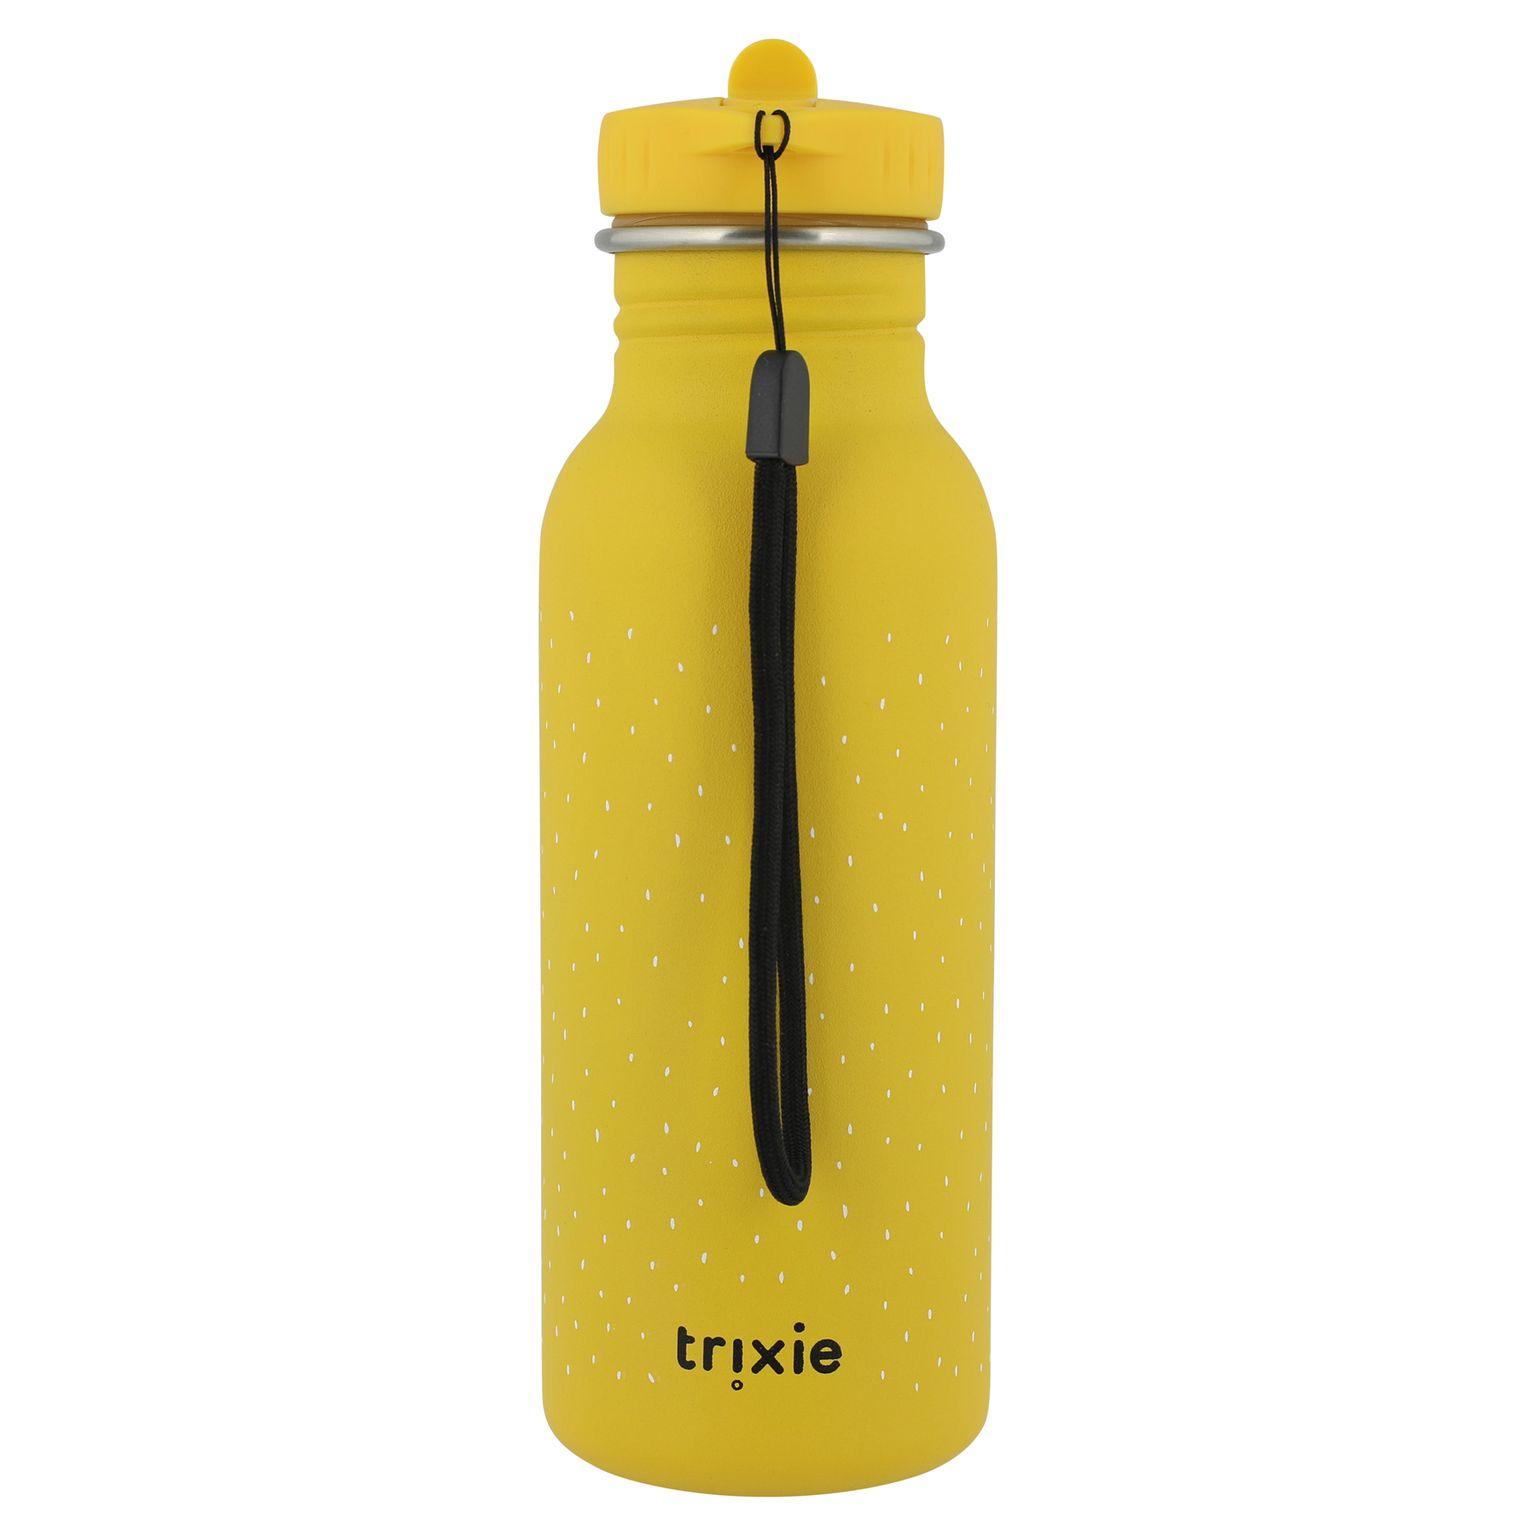 Afbeelding Trixie drinkfles 500ml – Mr Lion